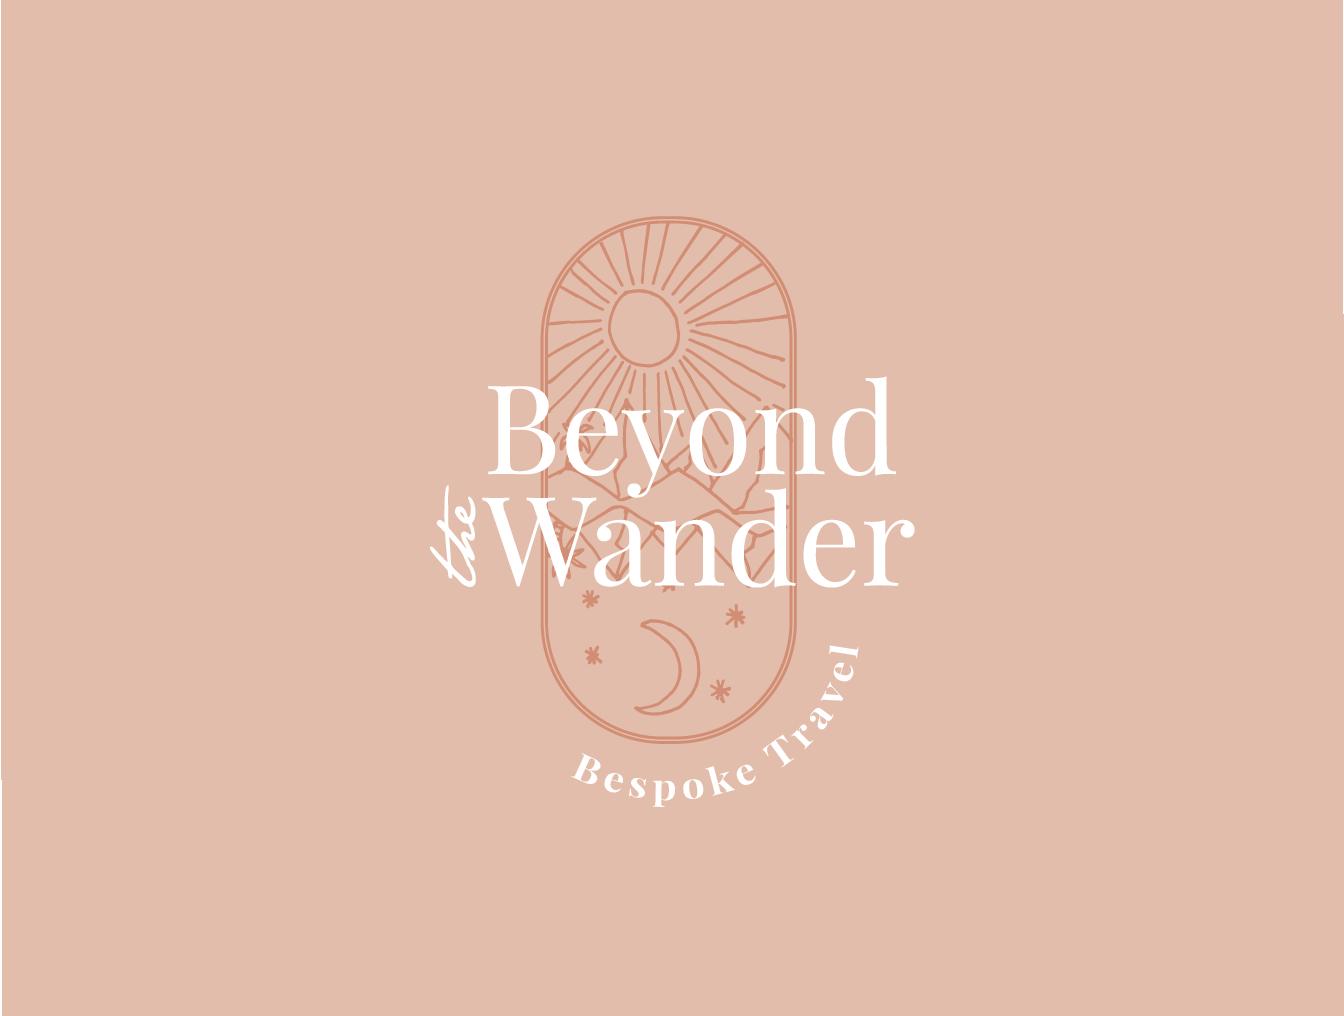 Beyond the wander - Branding & Print Design